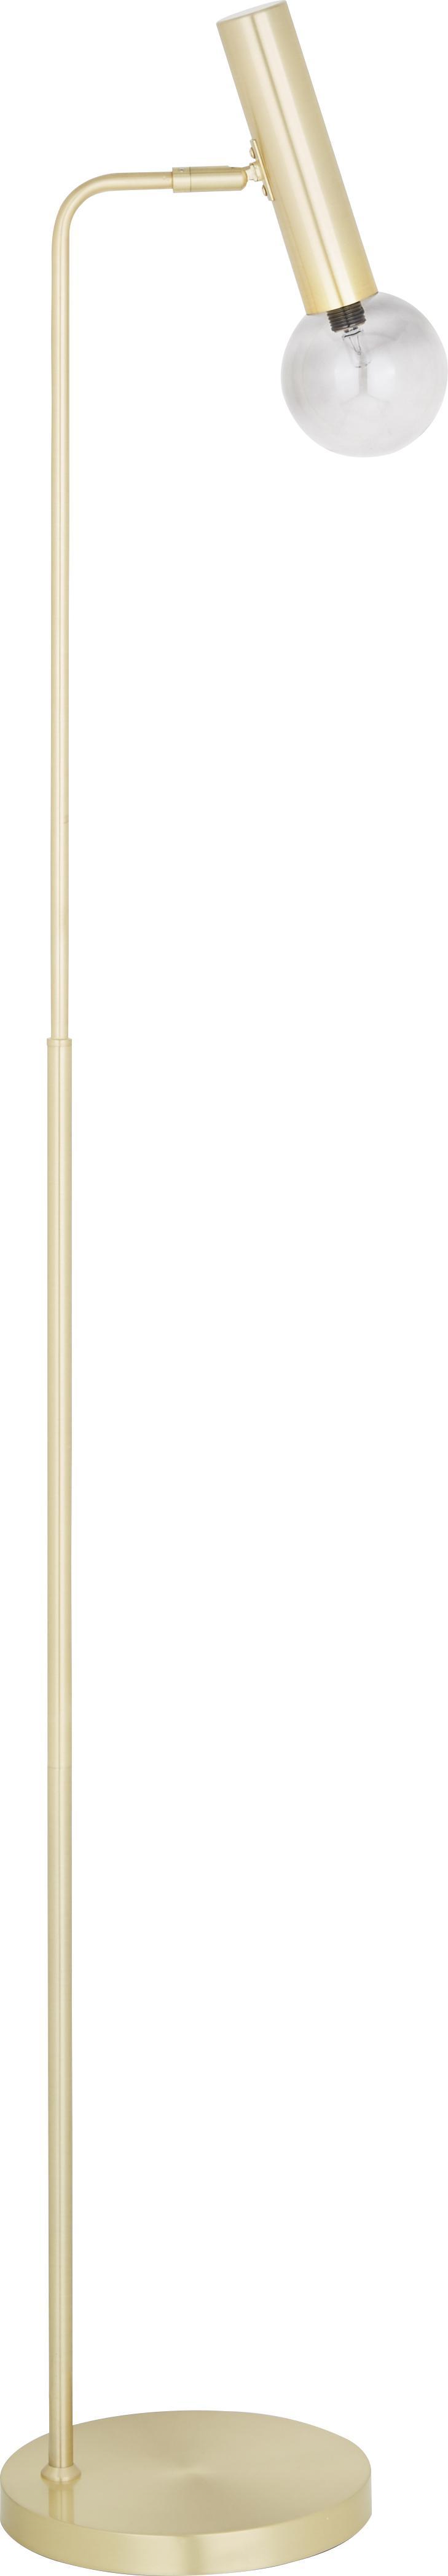 Vloerlamp Wilson, Frame: vermessingd metaal, Fitting: vermessingd metaal, Lampenkap: glas, Messingkleurig, Ø 23 x H 153 cm